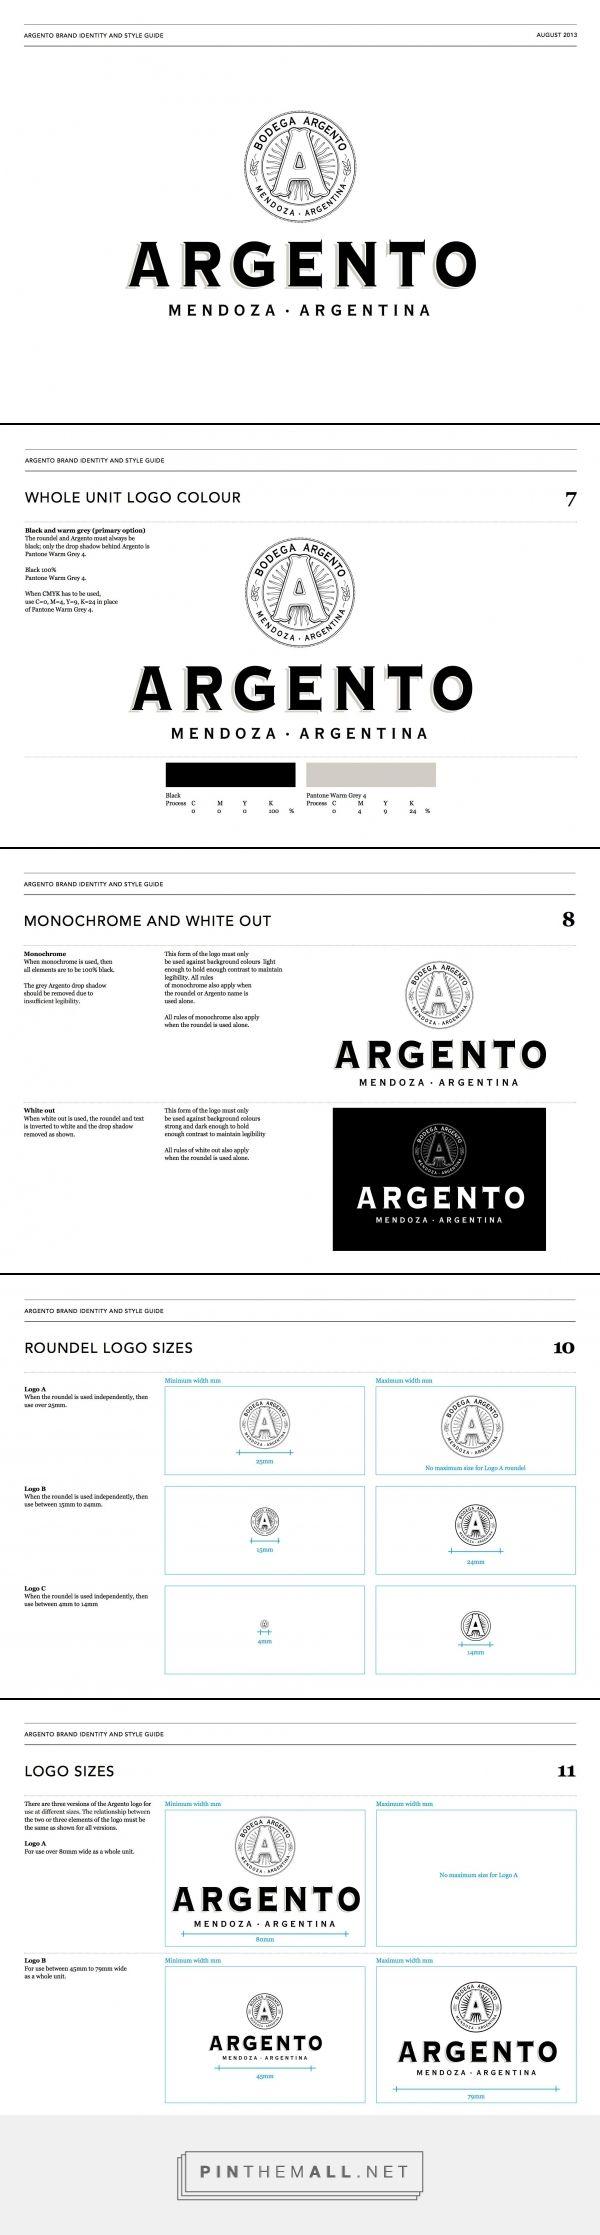 Argento Brand Logo Guidelines